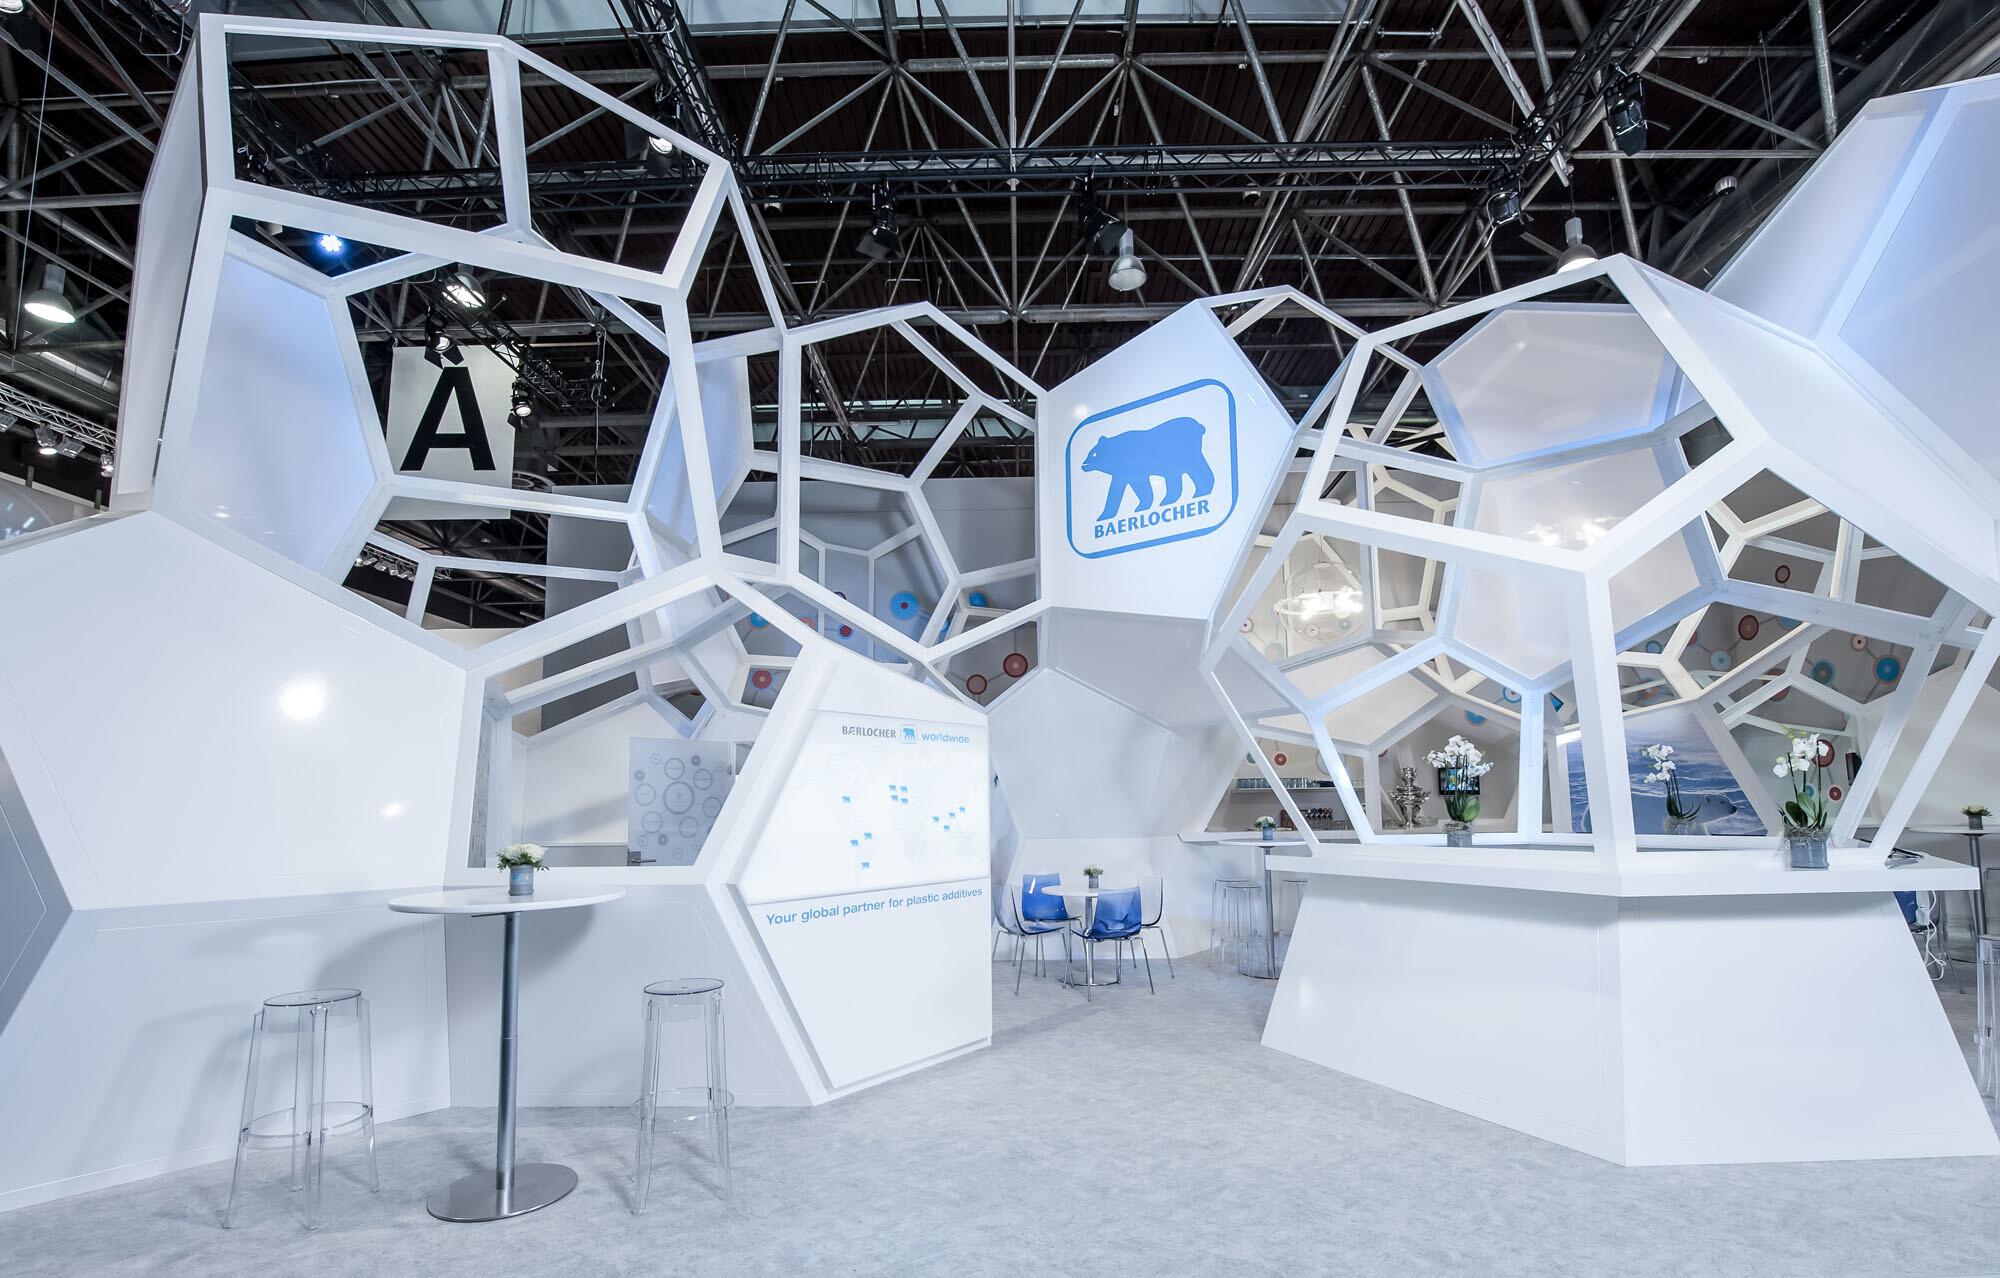 Trade Fair Stands Design : Janoschka fair stand at drupa by ippolito fleitz group